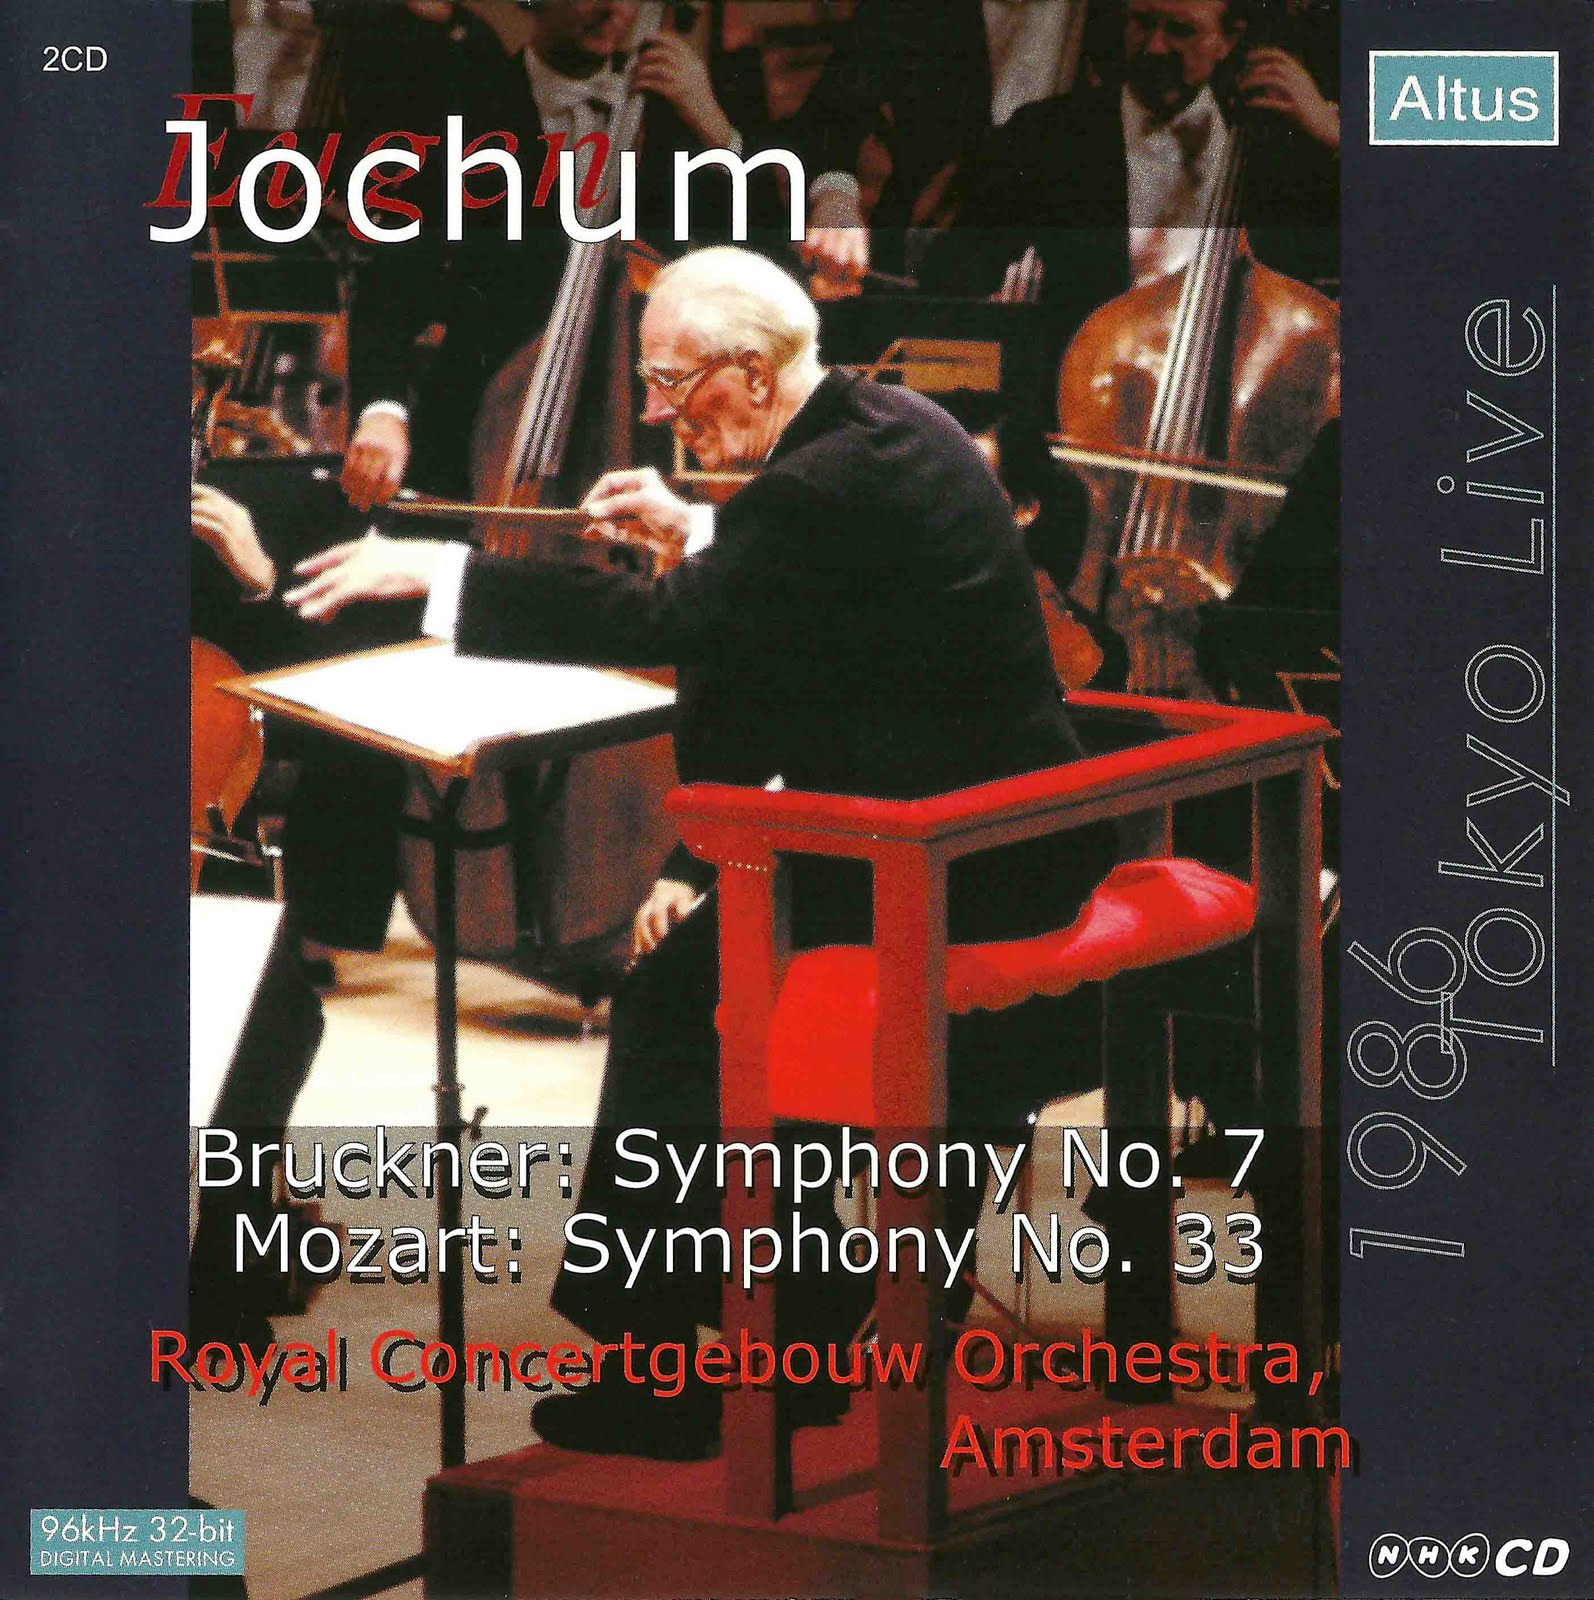 Jochum / Concertgebouworkest - Bruckner : Symphony No.7 etc. (2CD, 1986 Tokyo live)